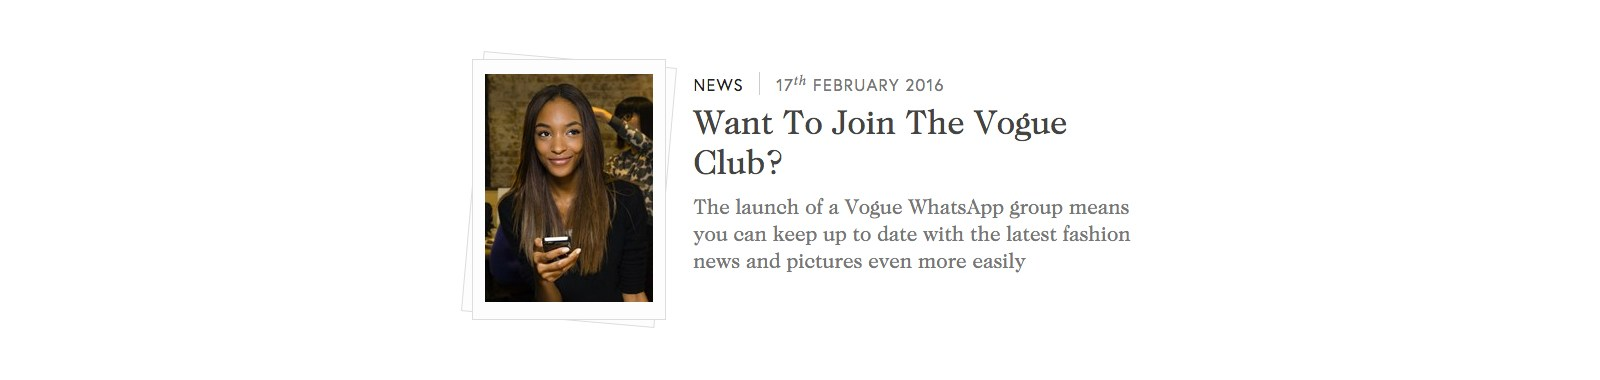 WhatsApp_Vogue